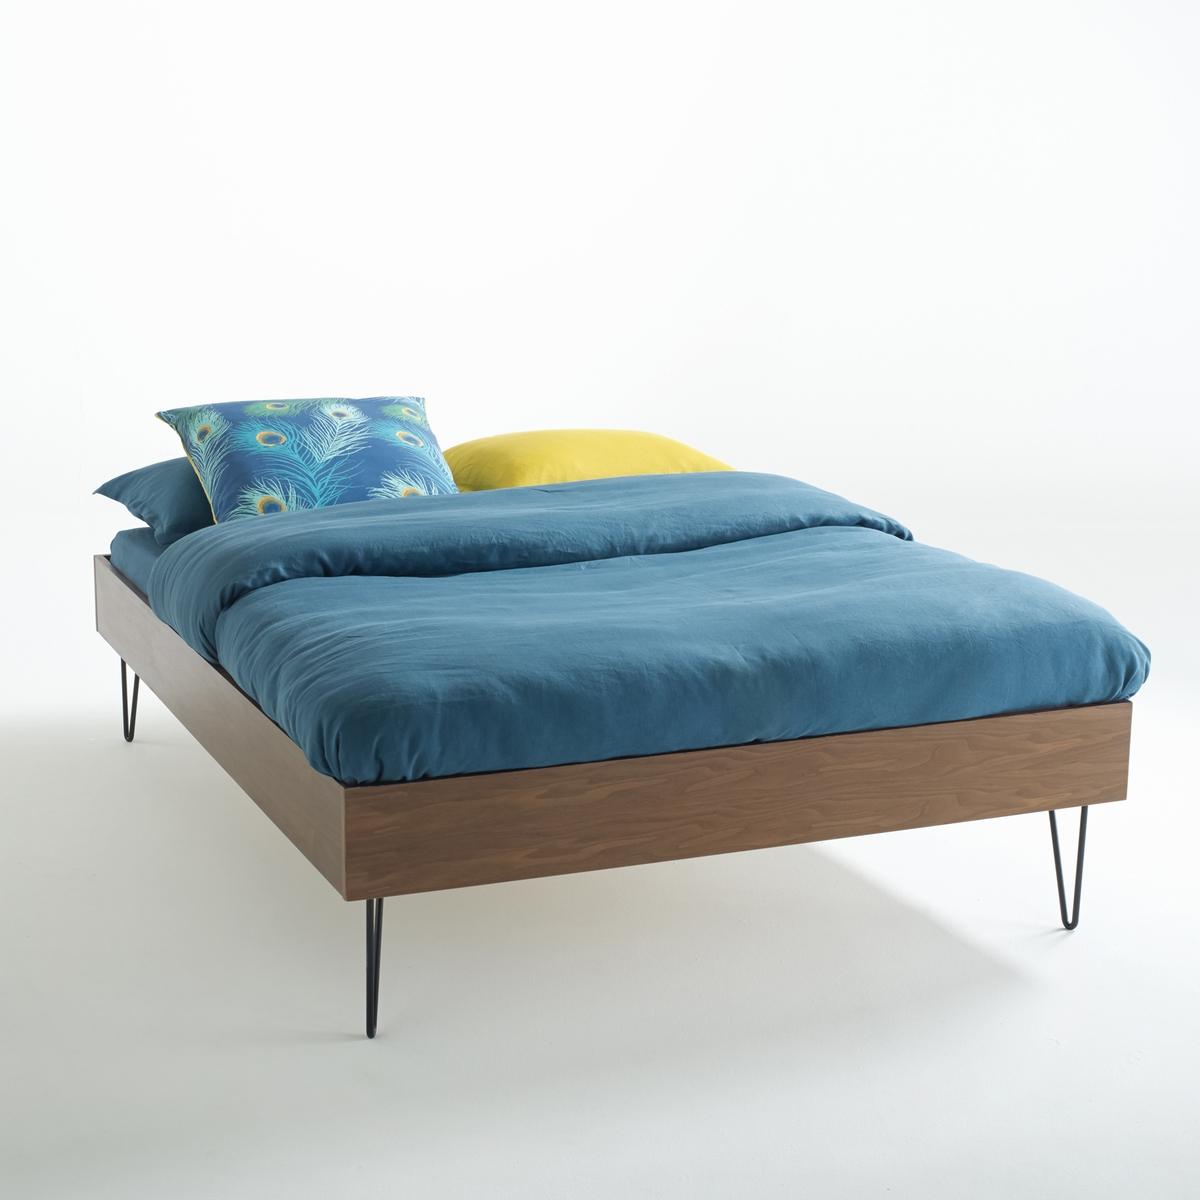 "Bett \""Watford\"", Vintage-Stil"